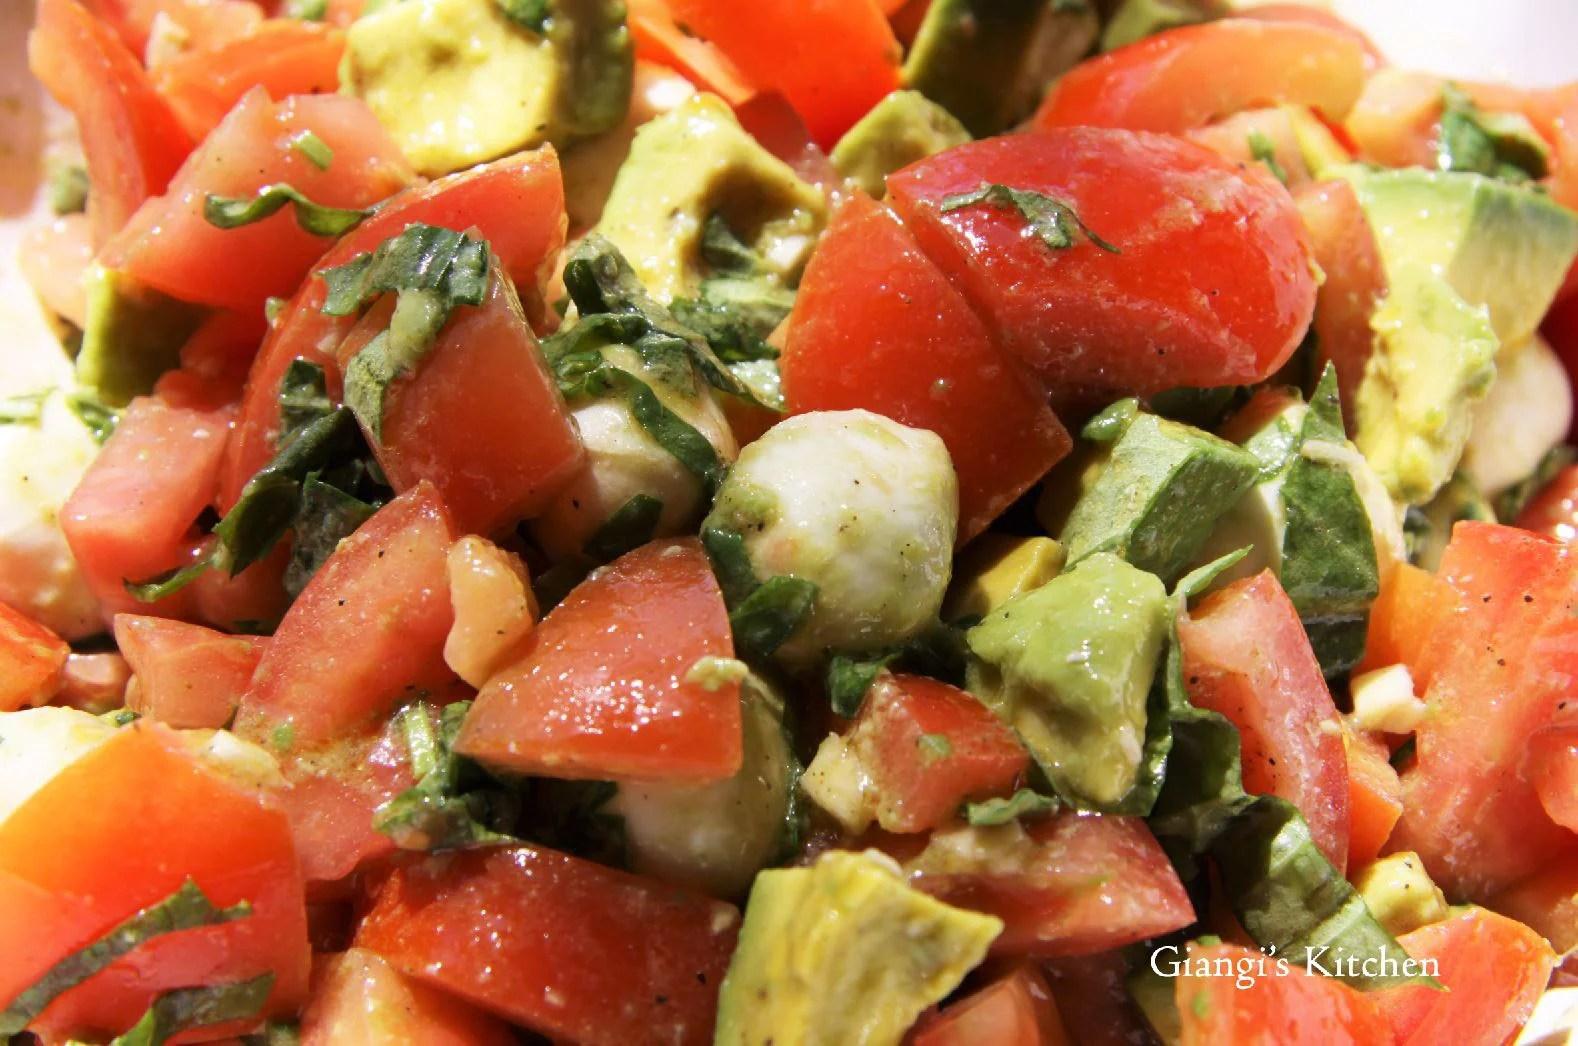 Avocado, mozzarella and tomatoes with vinaigrette